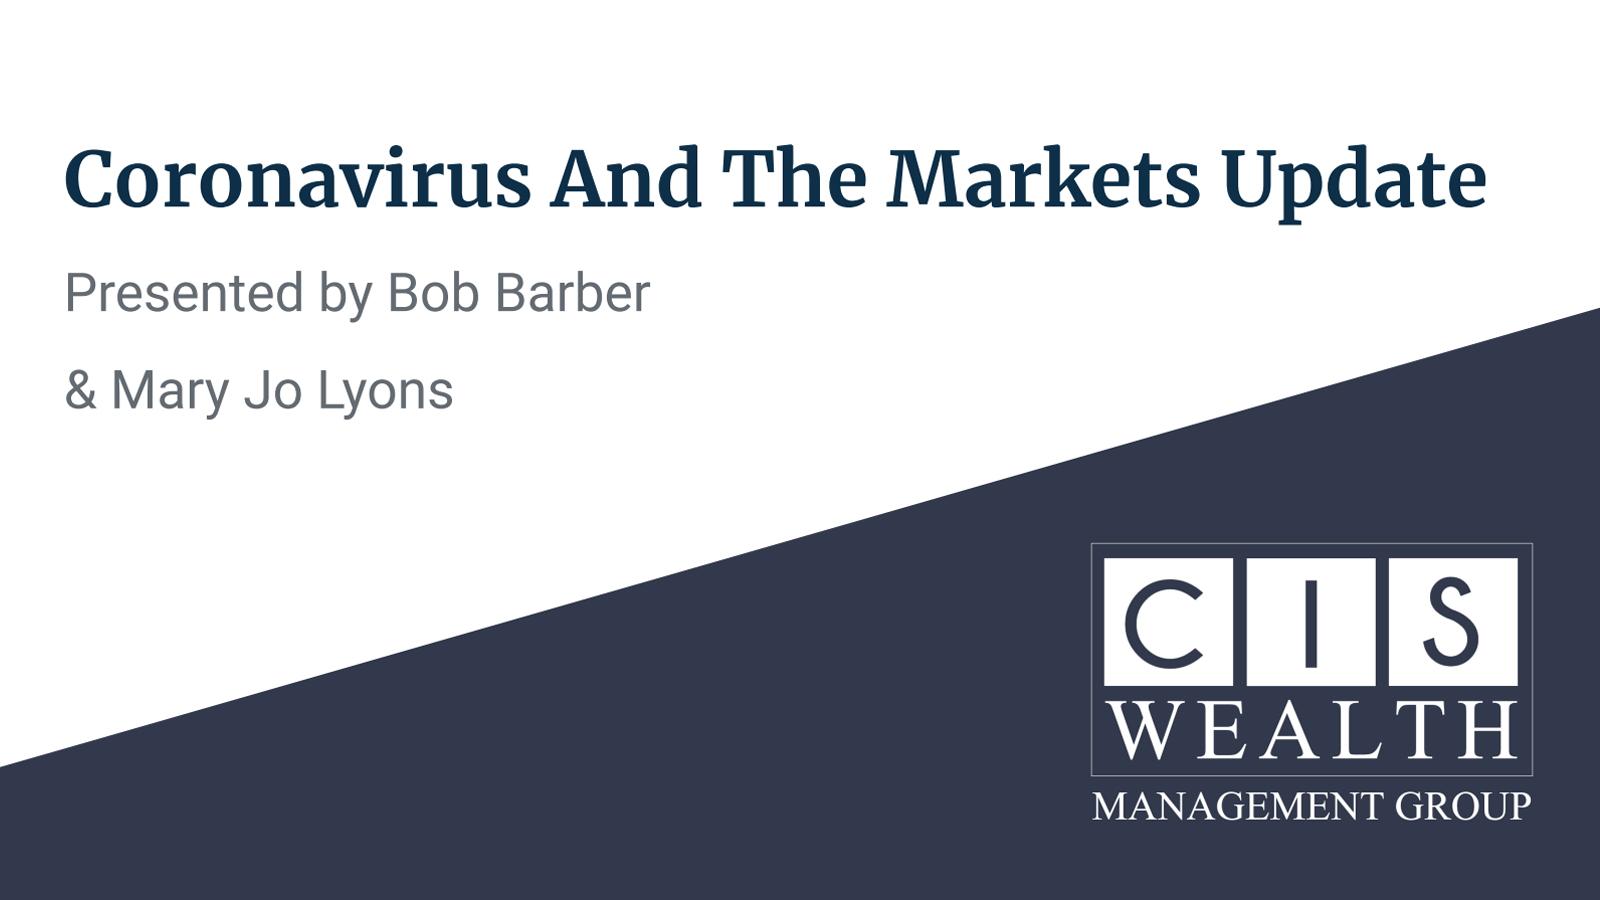 Coronavirus and markets update presentation slide cover